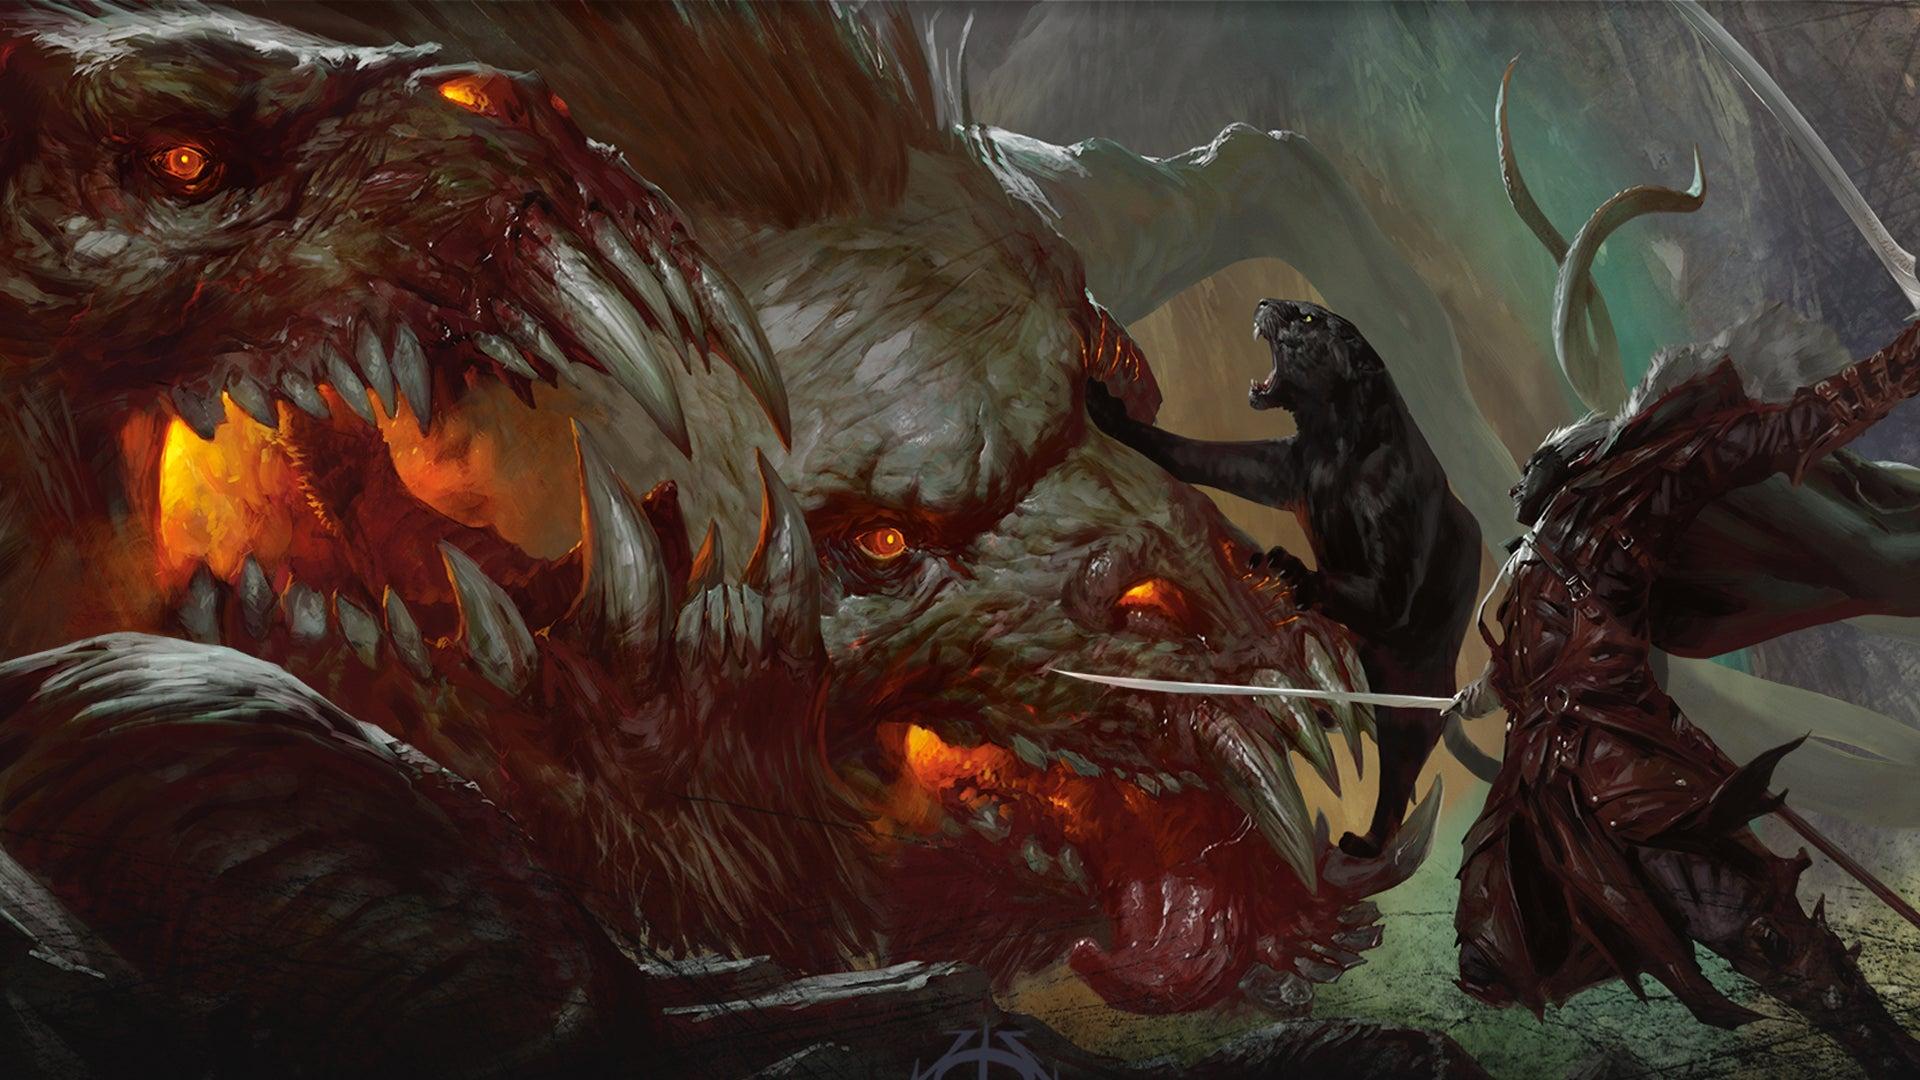 Dungeons & Dragons roleplaying game artwork 22